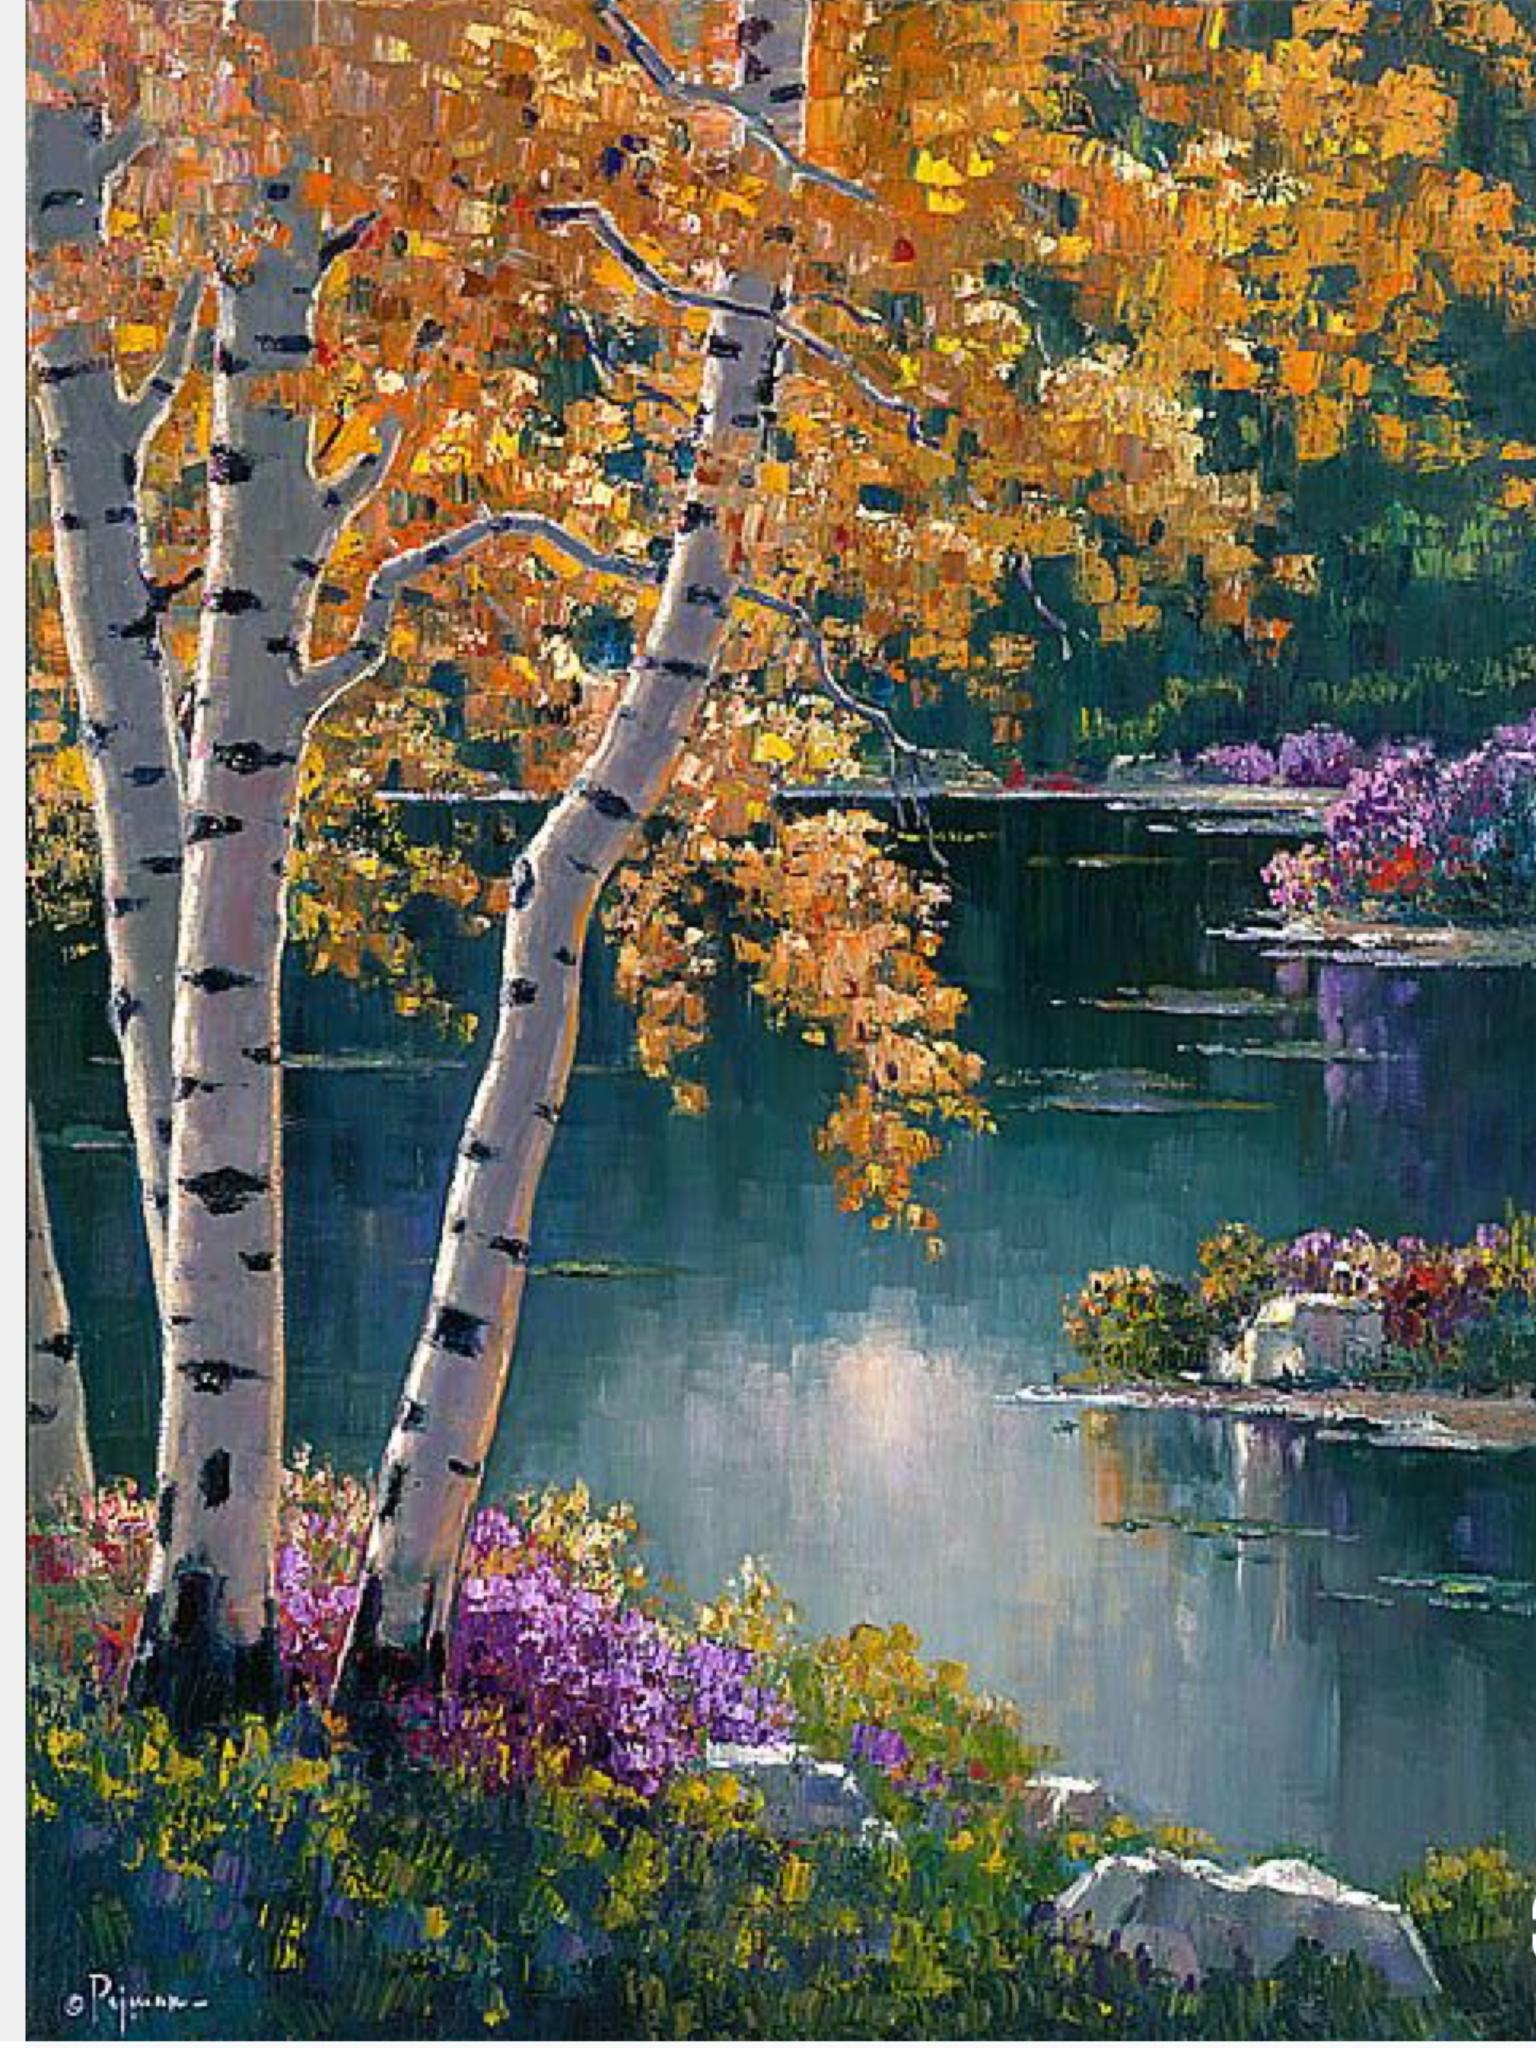 Sedona Aspens by Bob Pejman Landscape paintings